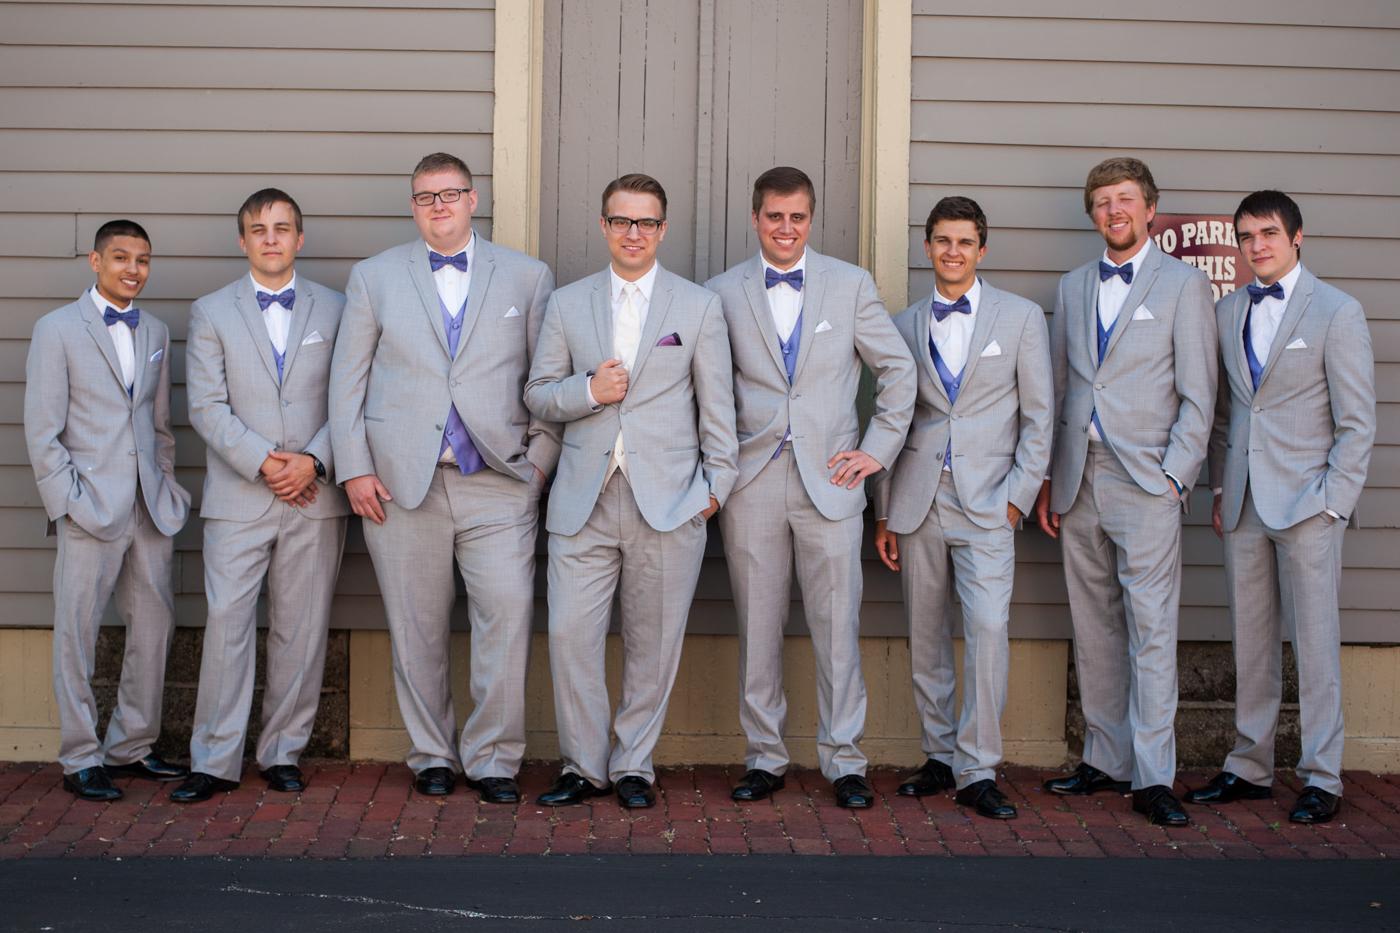 carpenter_wedding-62.jpg